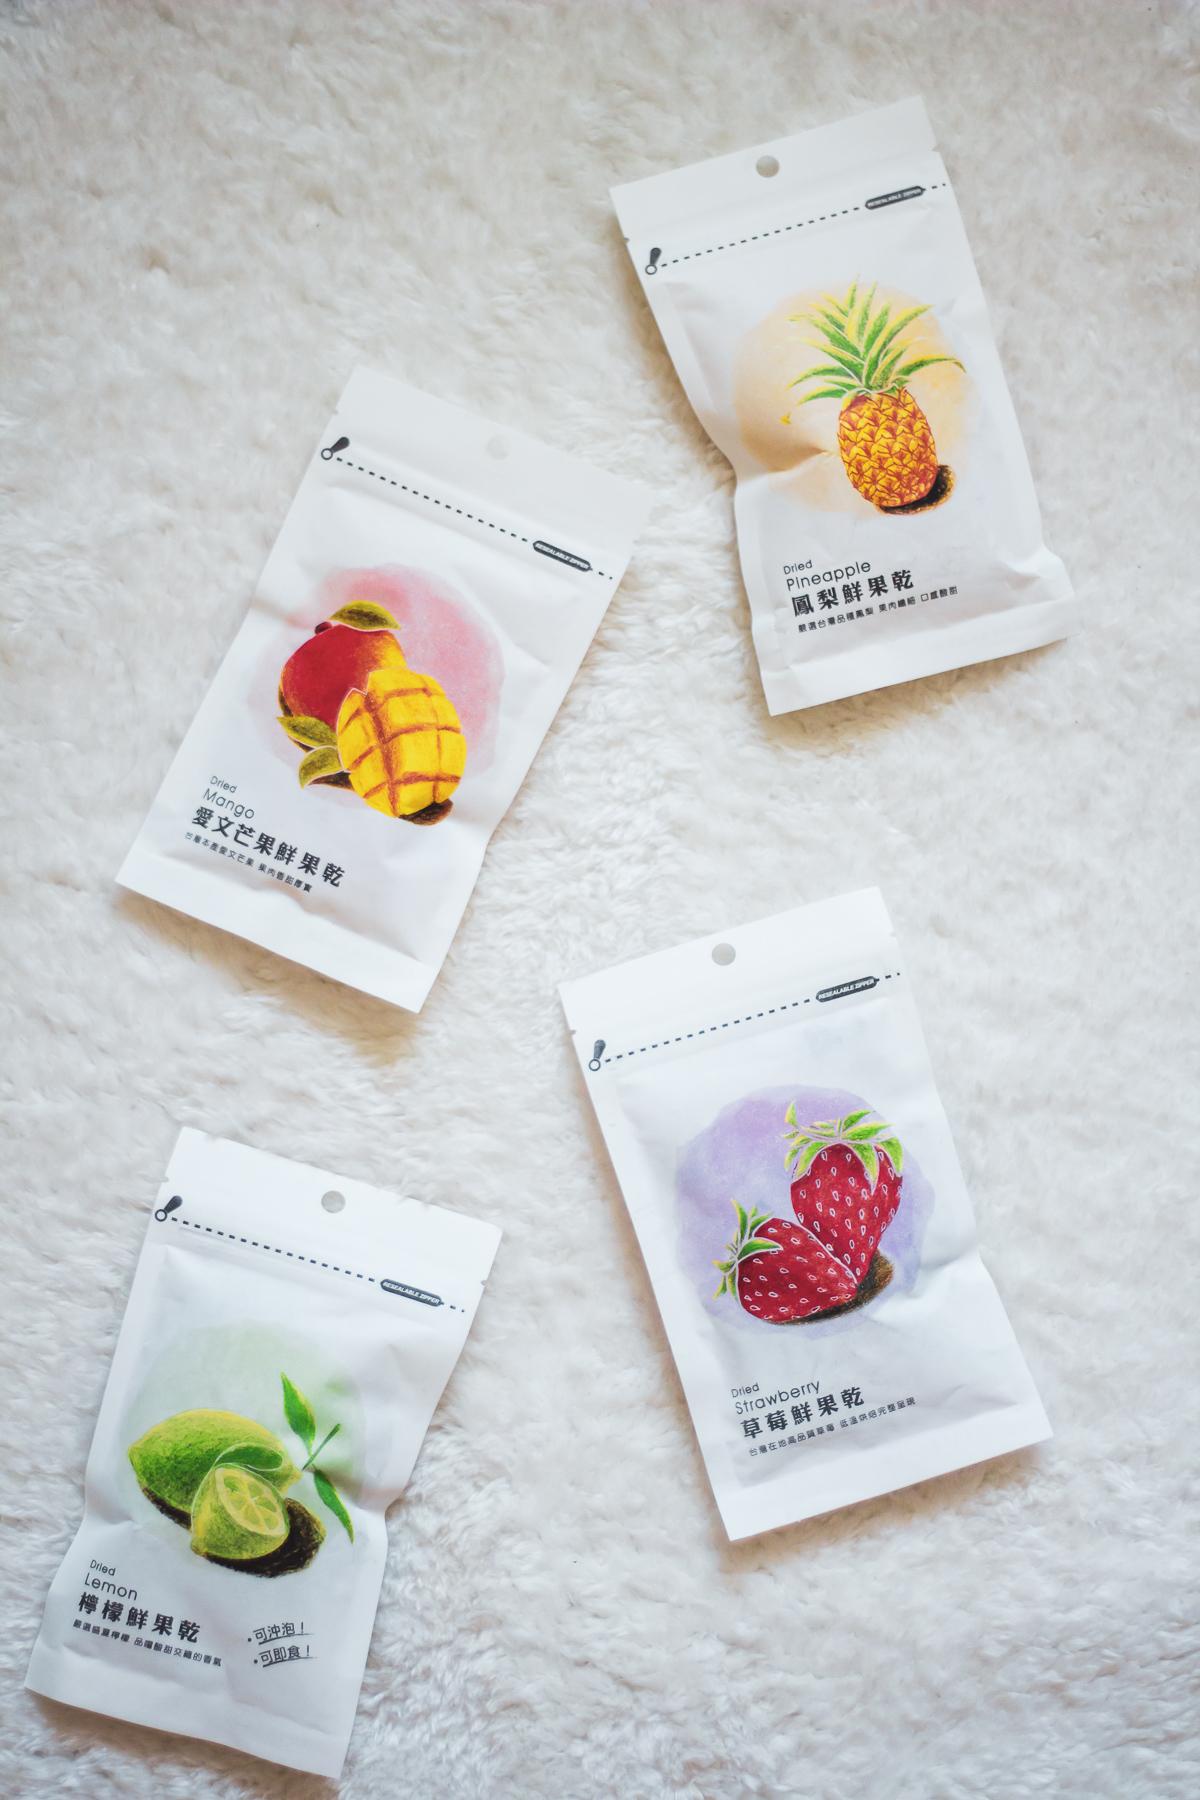 Snack from Taiwan 7/11 – LePlainCanvas